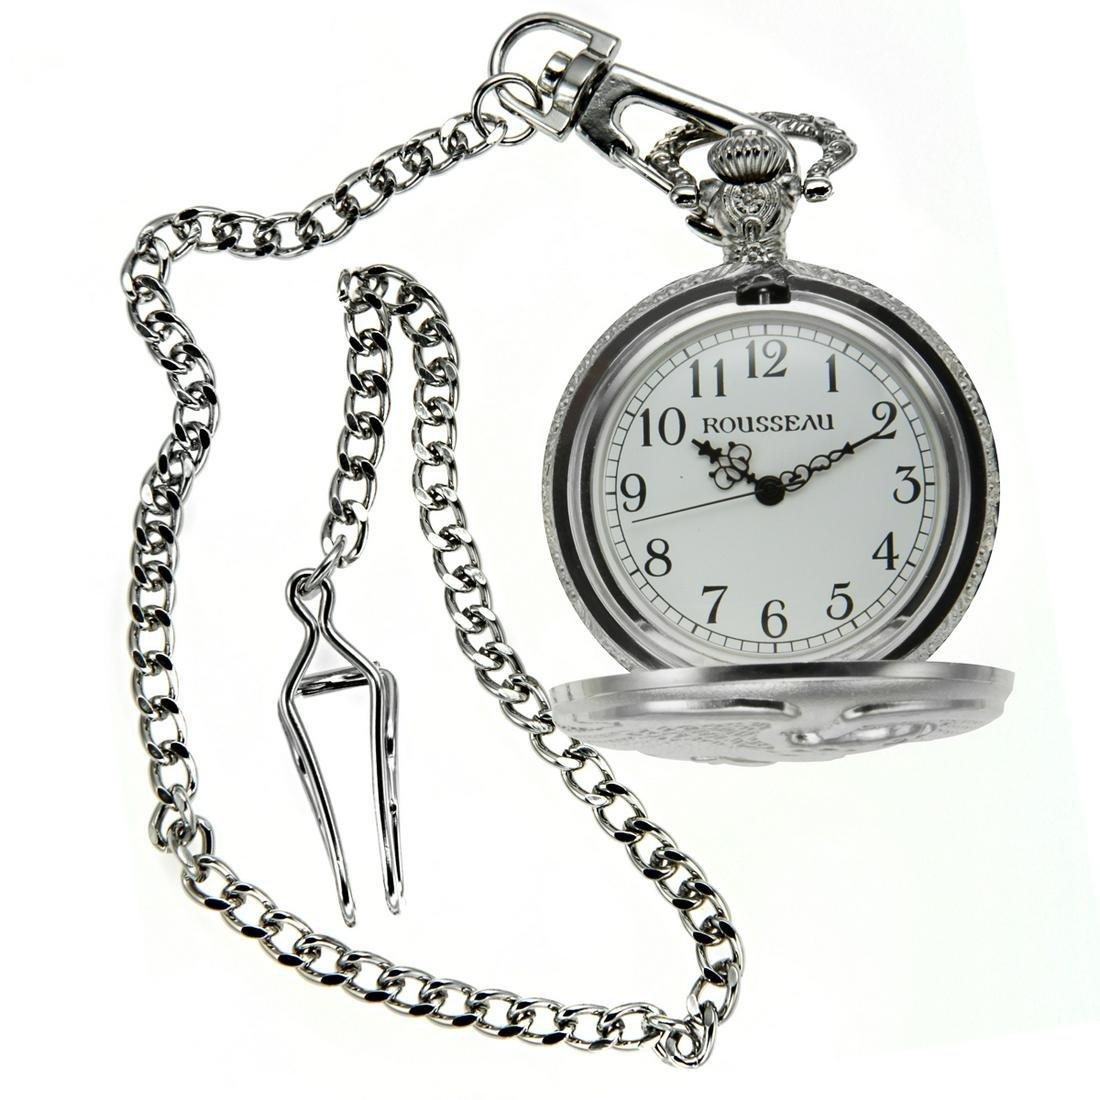 Rousseau 42mm Case Eagle Engraved Pocket Watch